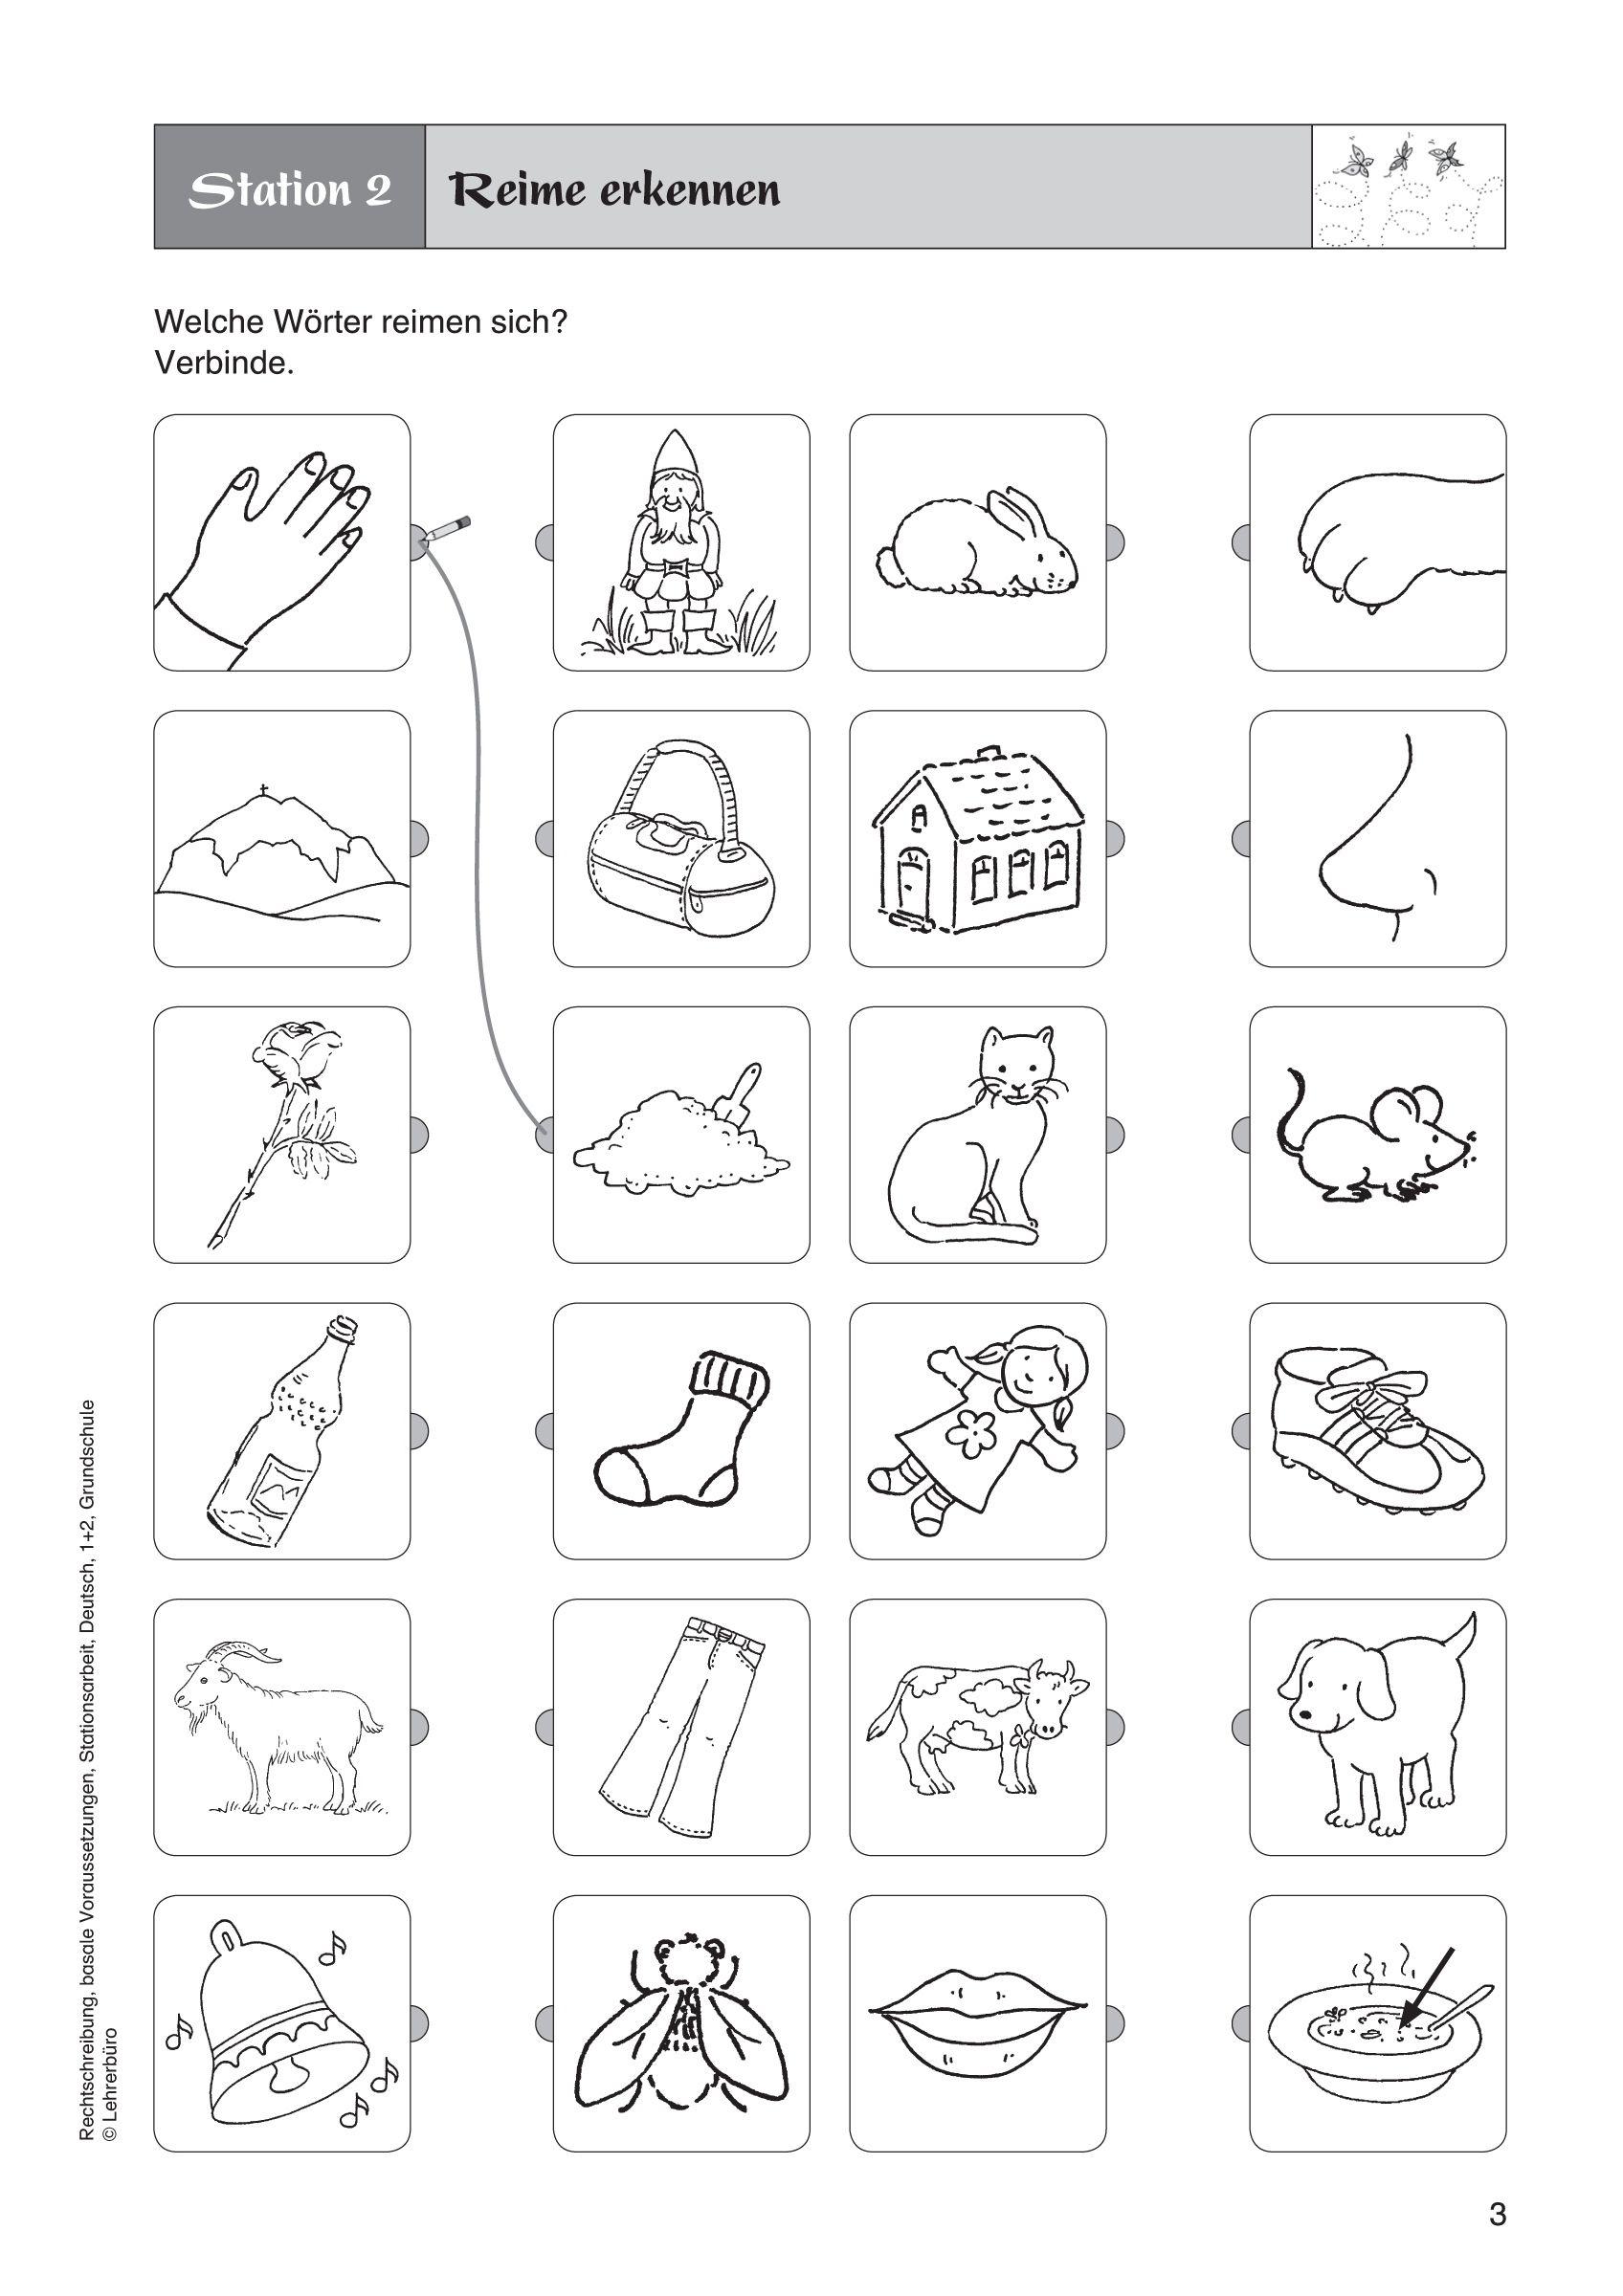 Arbeitsblätter Grundschule 1 Klasse Ausdrucken 1 Klasse ganzes Grundschule 1 Klasse Deutsch Übungsblätter